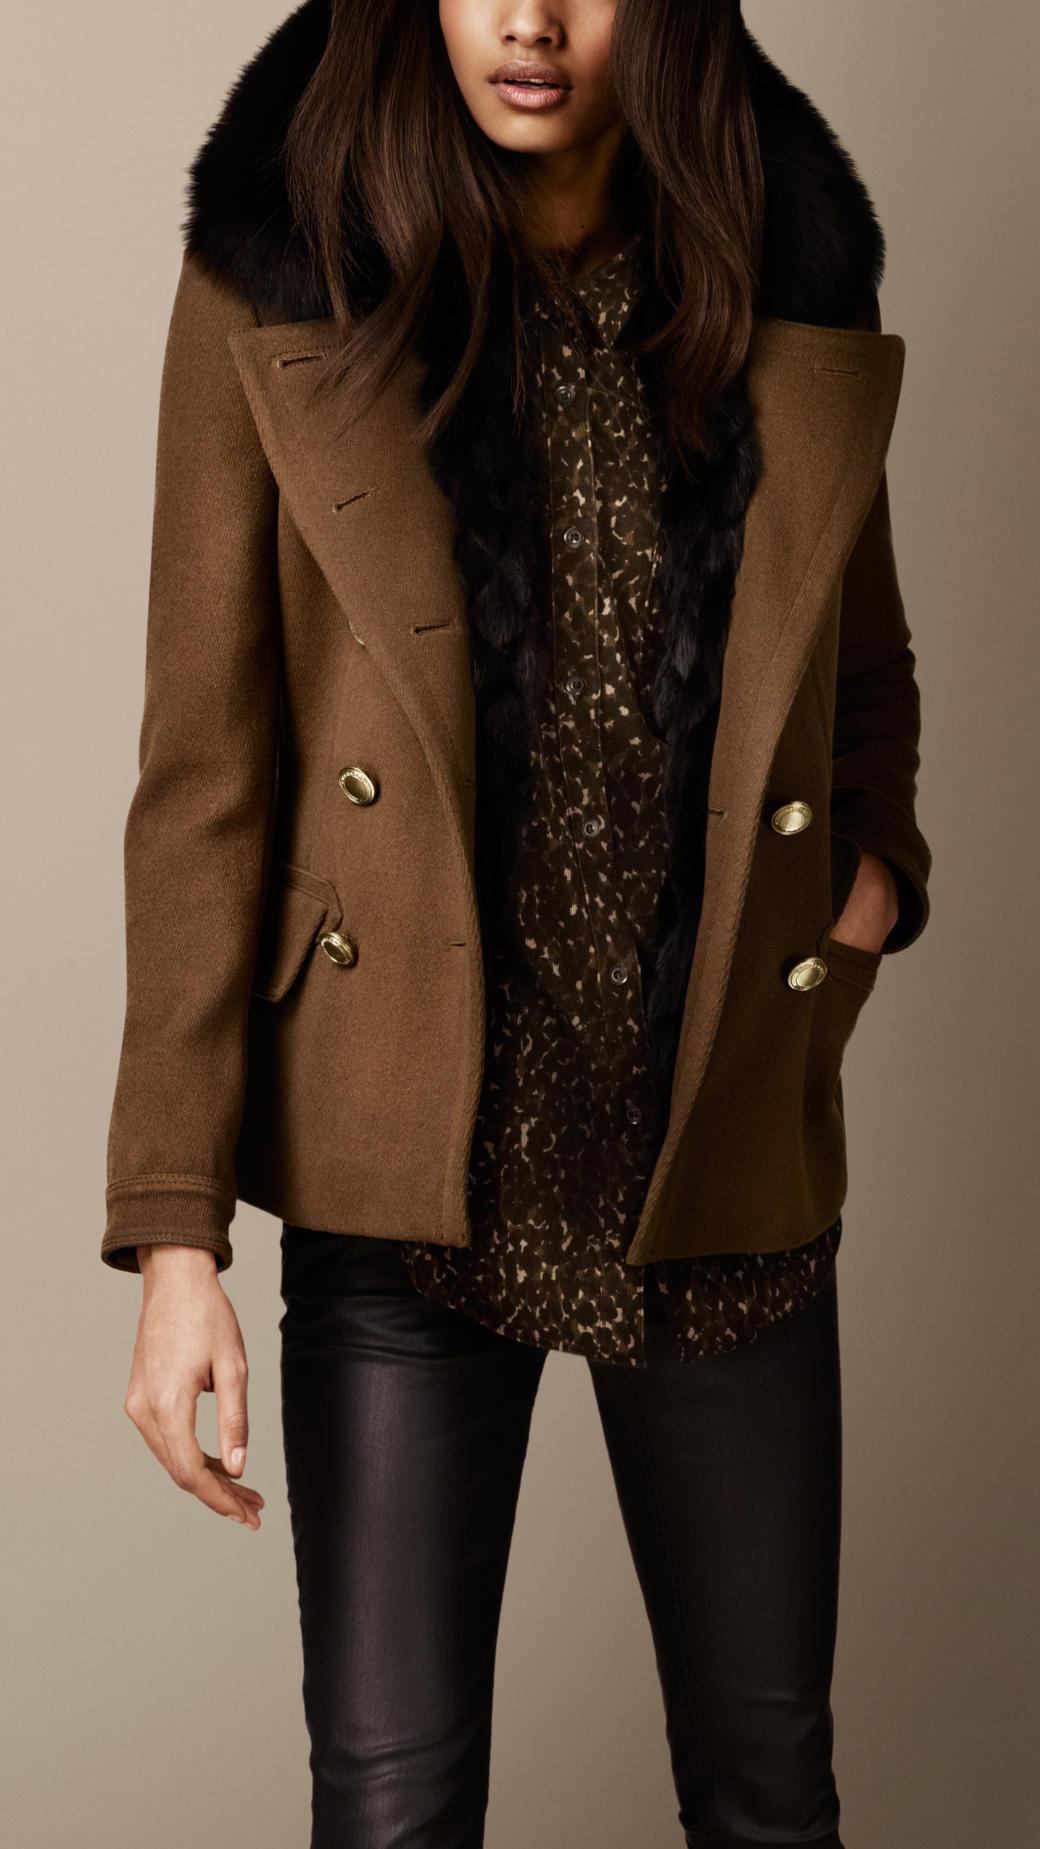 Brown Pea Coat Jacket - Tradingbasis